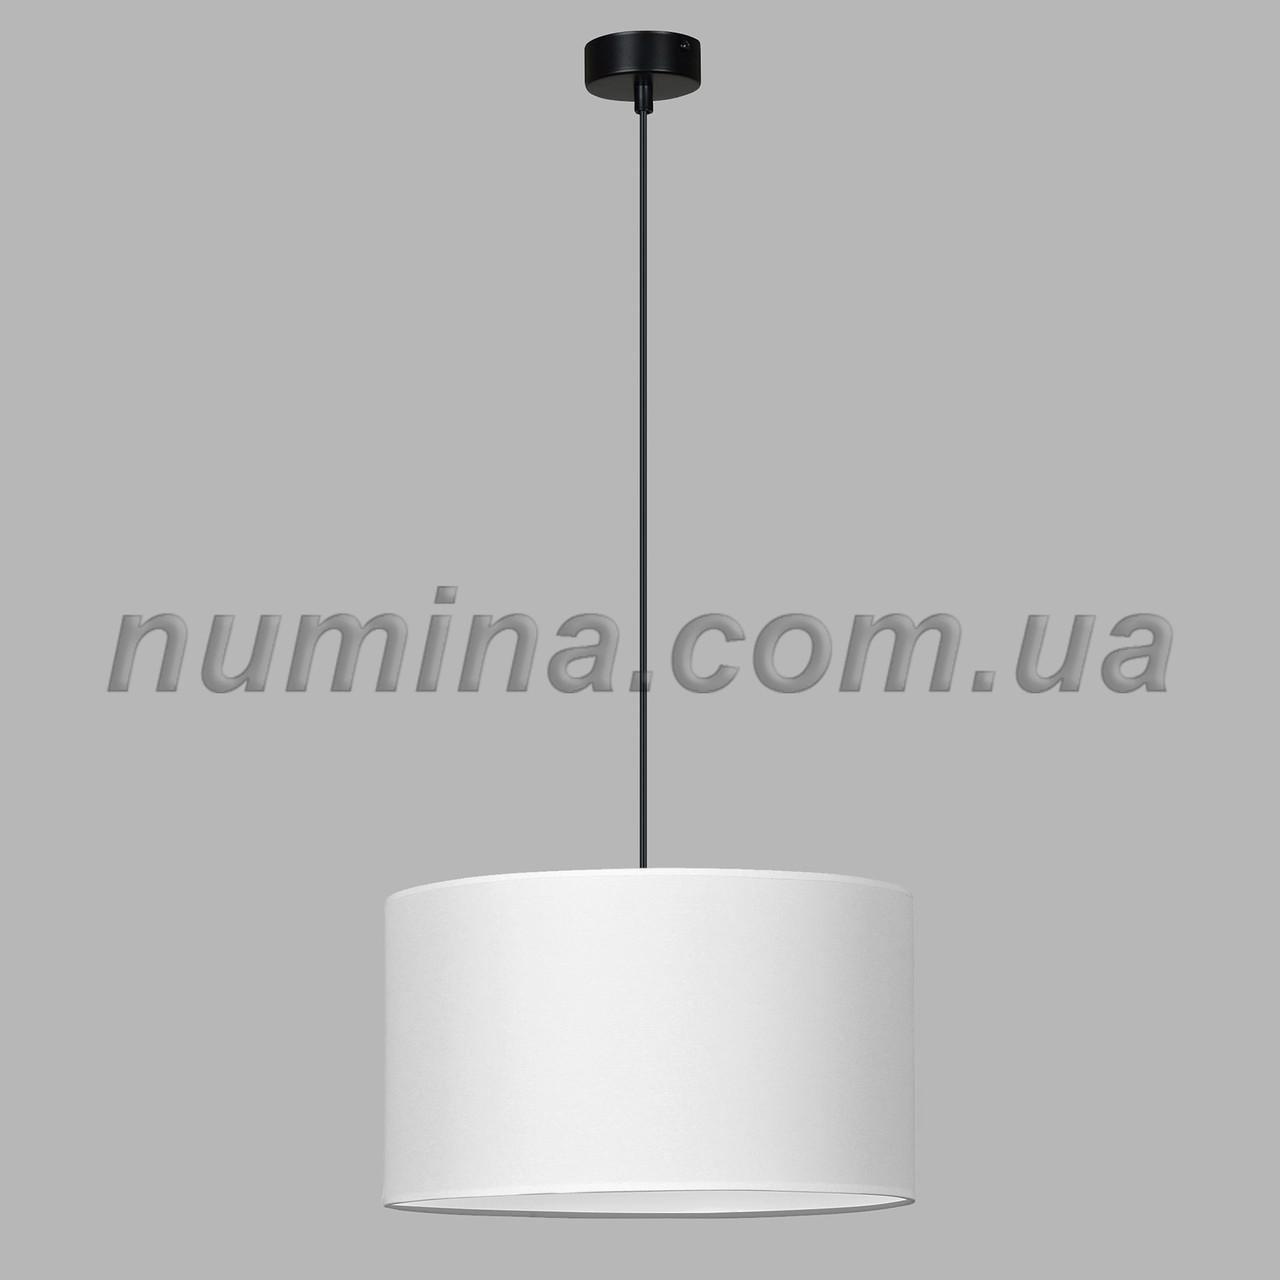 Люстра подвесная на одну лампу 29-S296/1B BK+WT